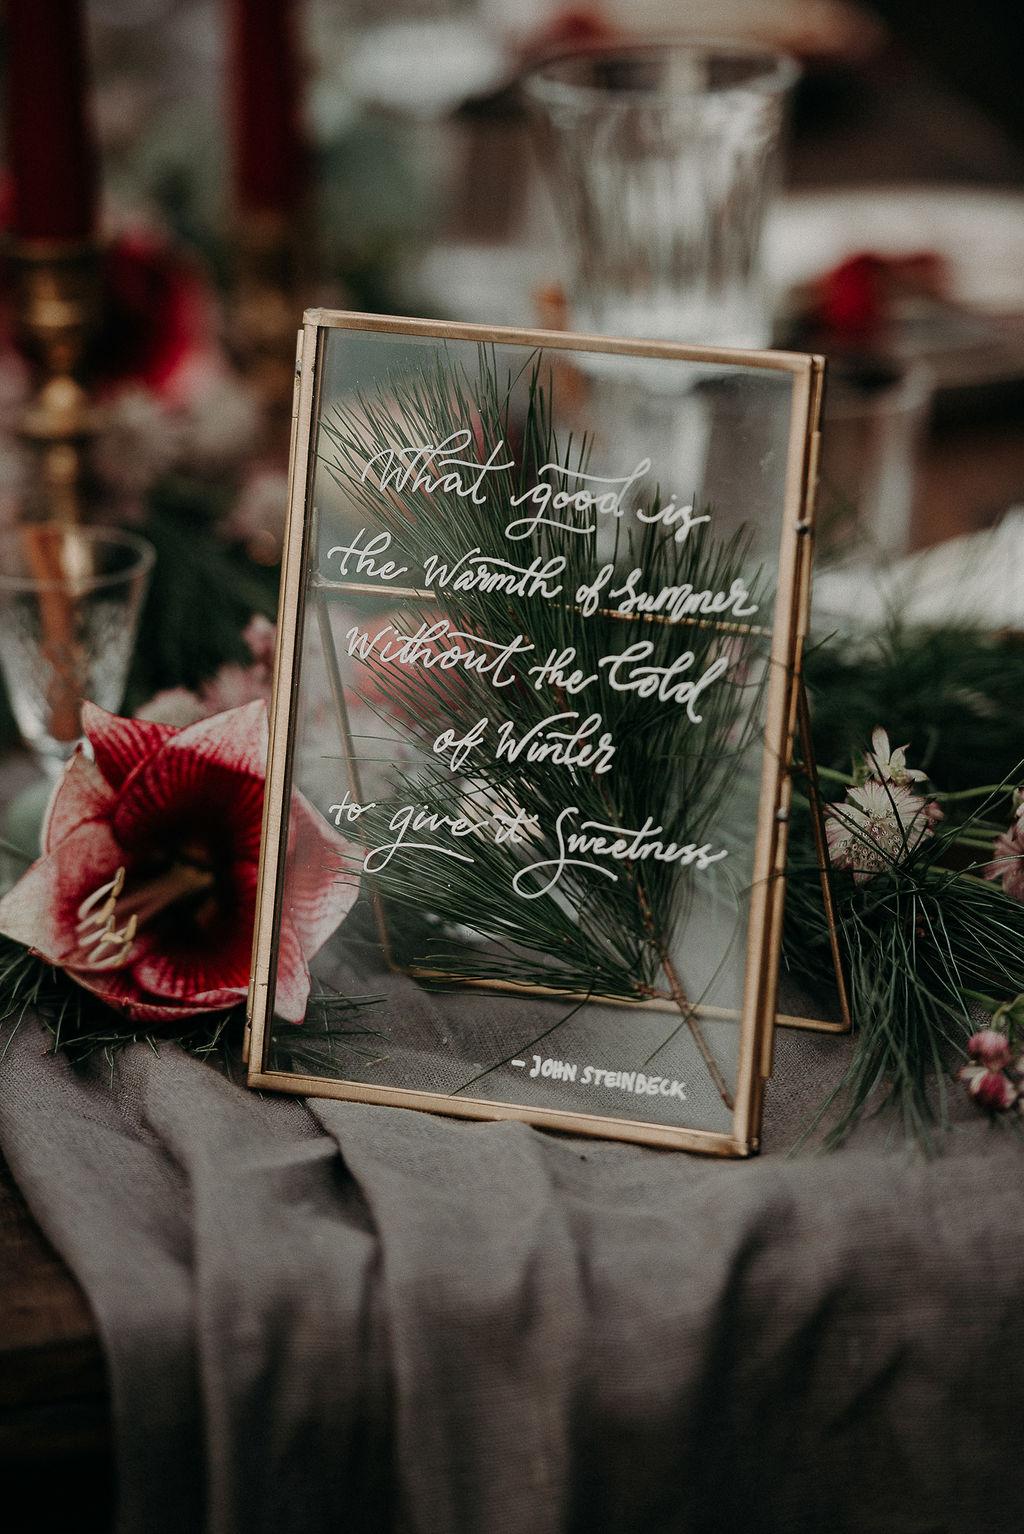 Julbröllop+vinterbröllop+dukning8.jpg